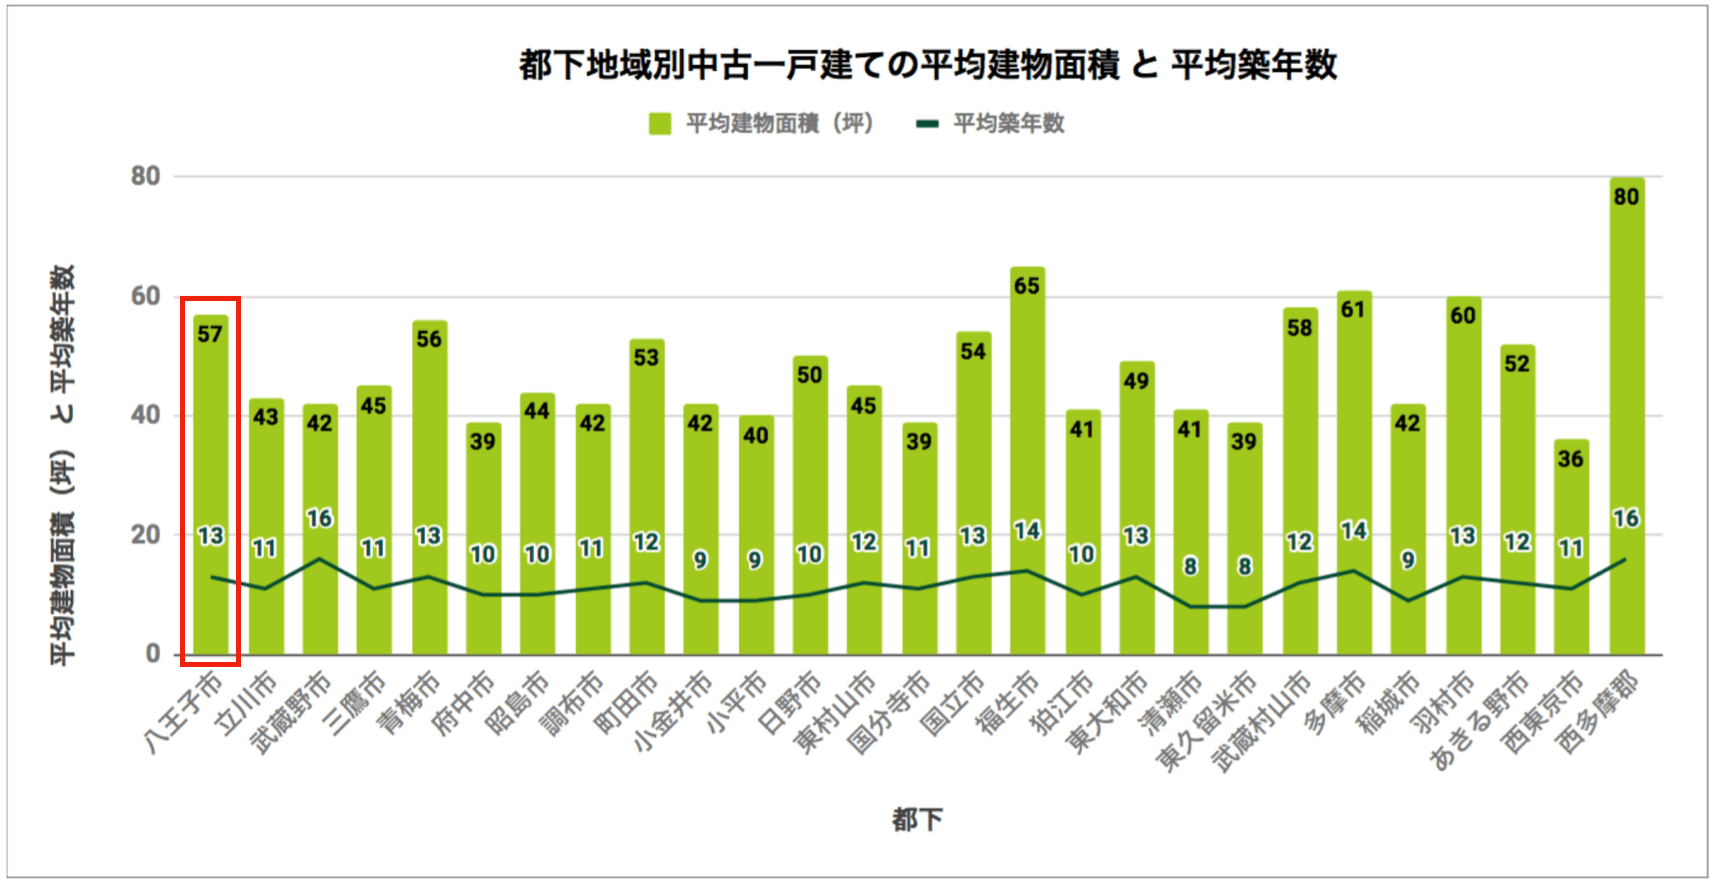 都下地域別中古一戸建ての平均建物面積と平均築年数